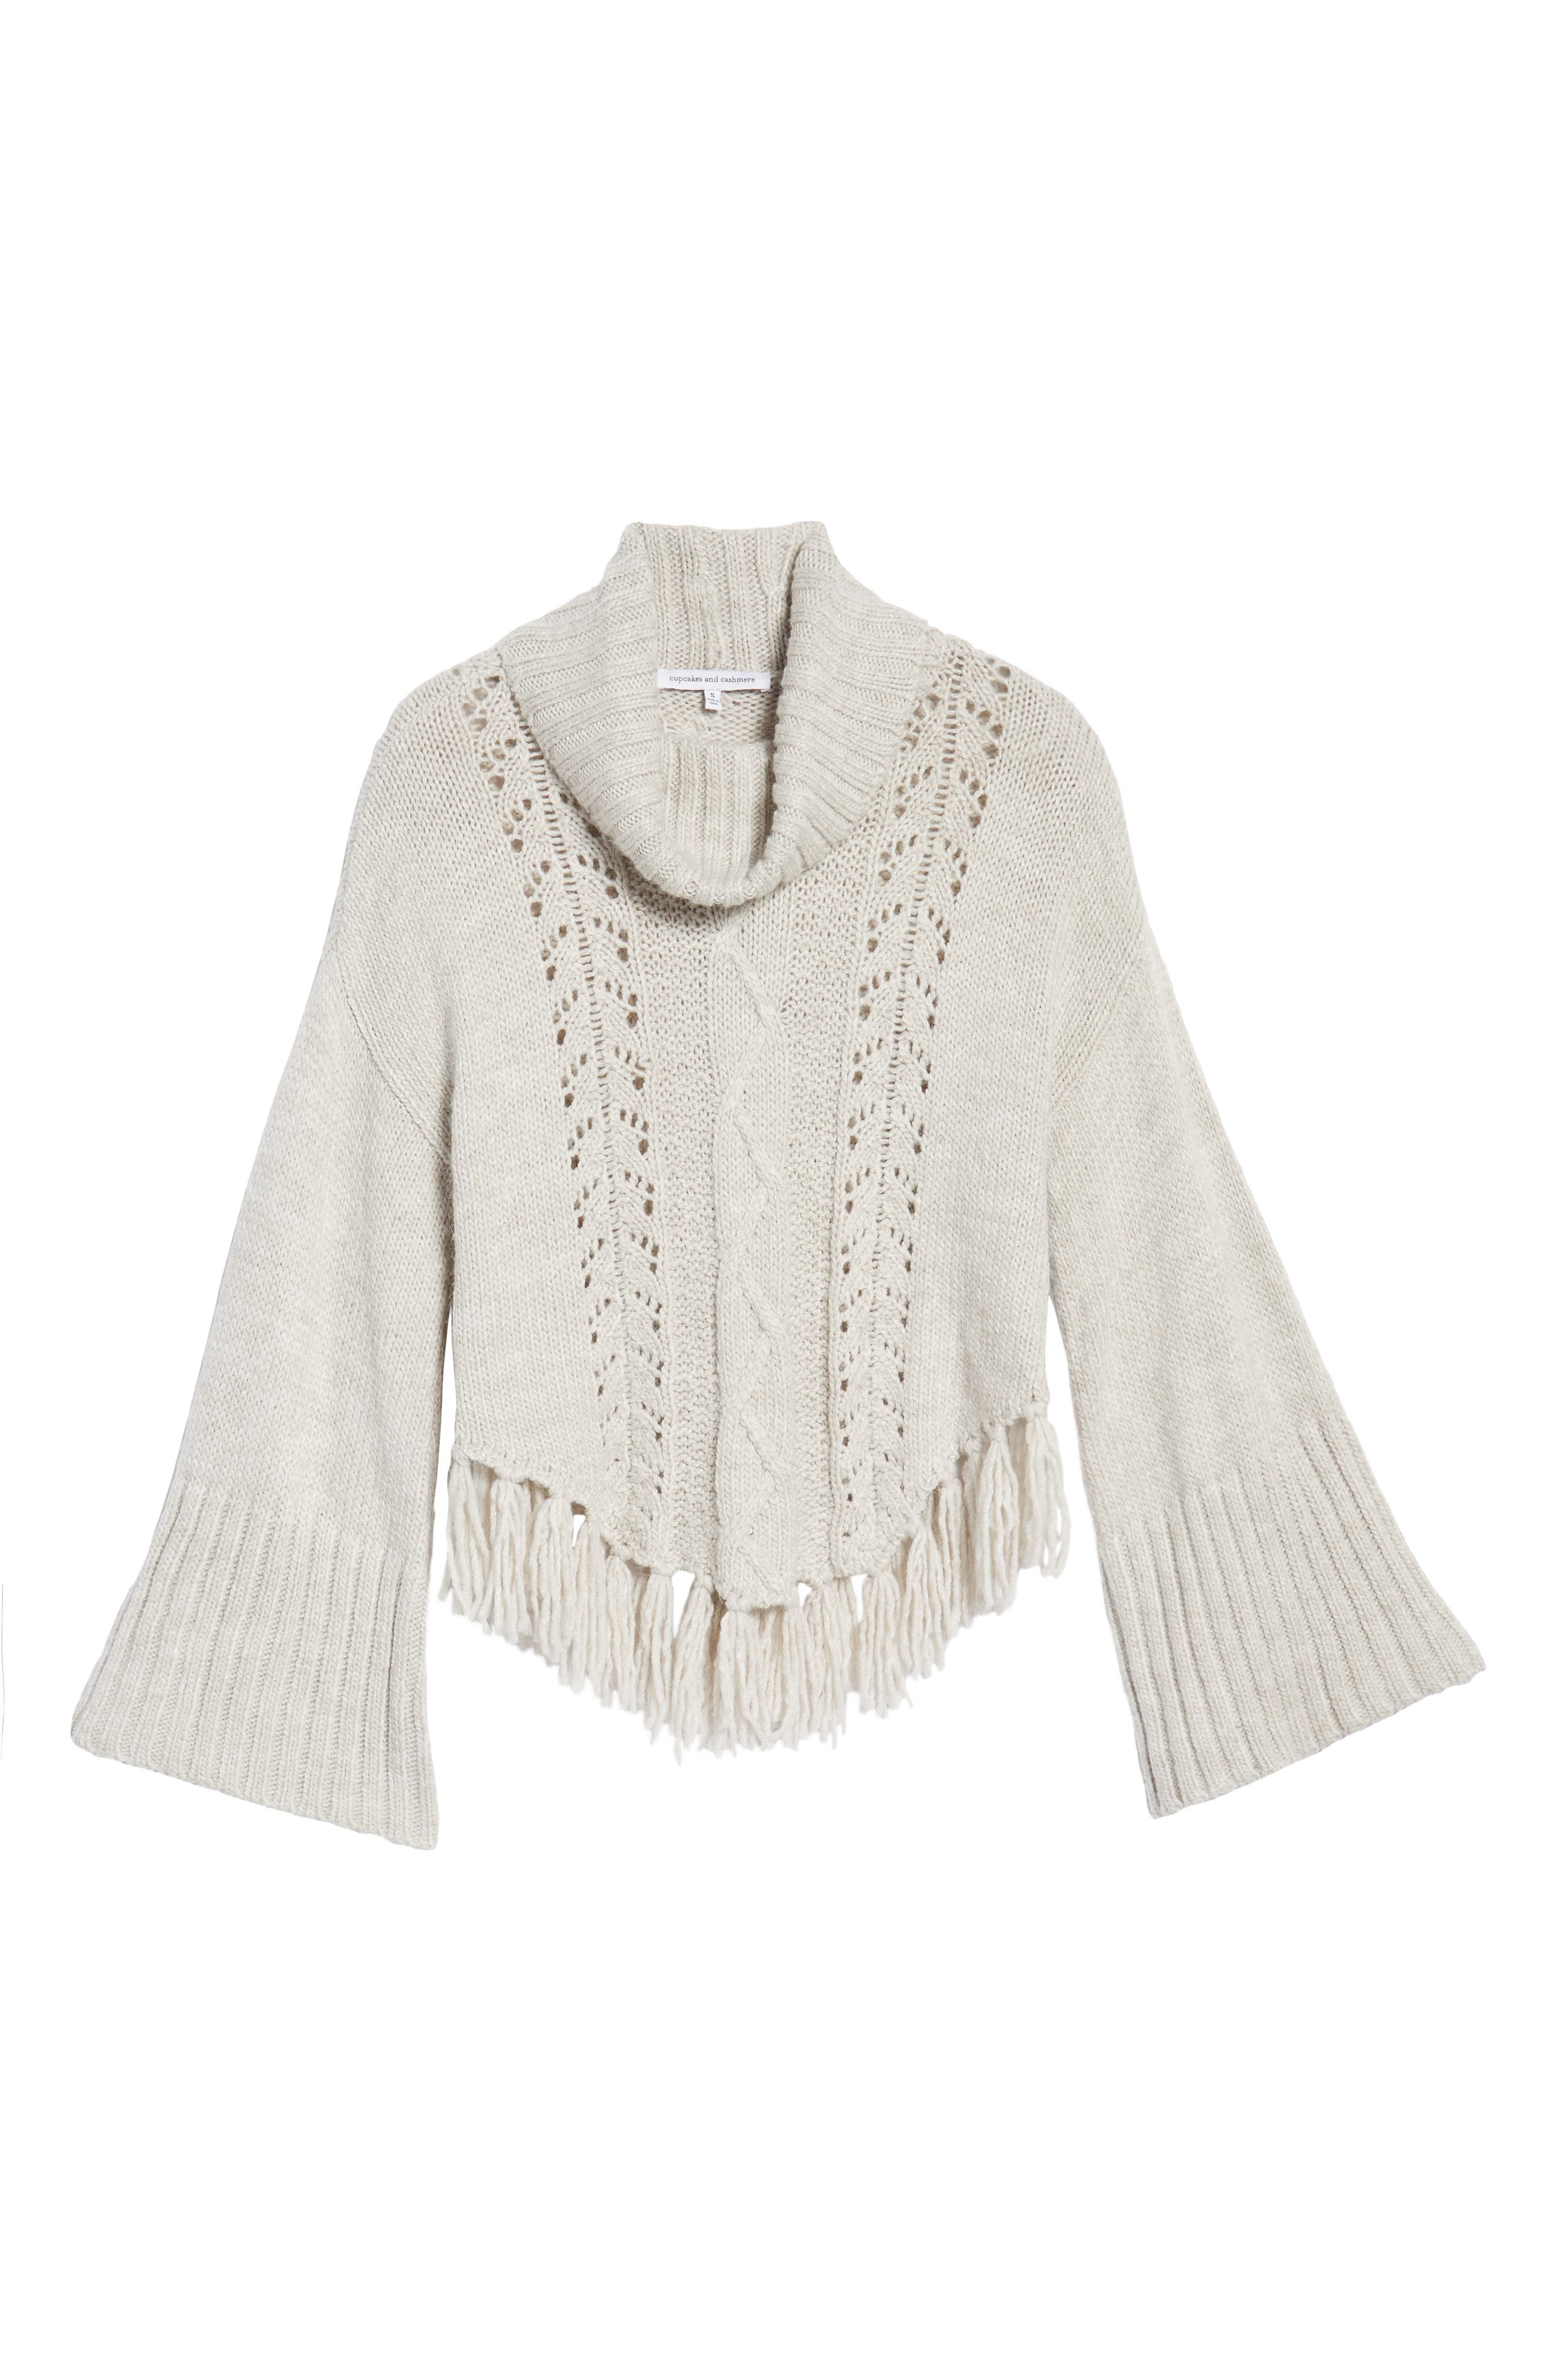 Prilla Fringe Cowl Neck Sweater,                             Alternate thumbnail 6, color,